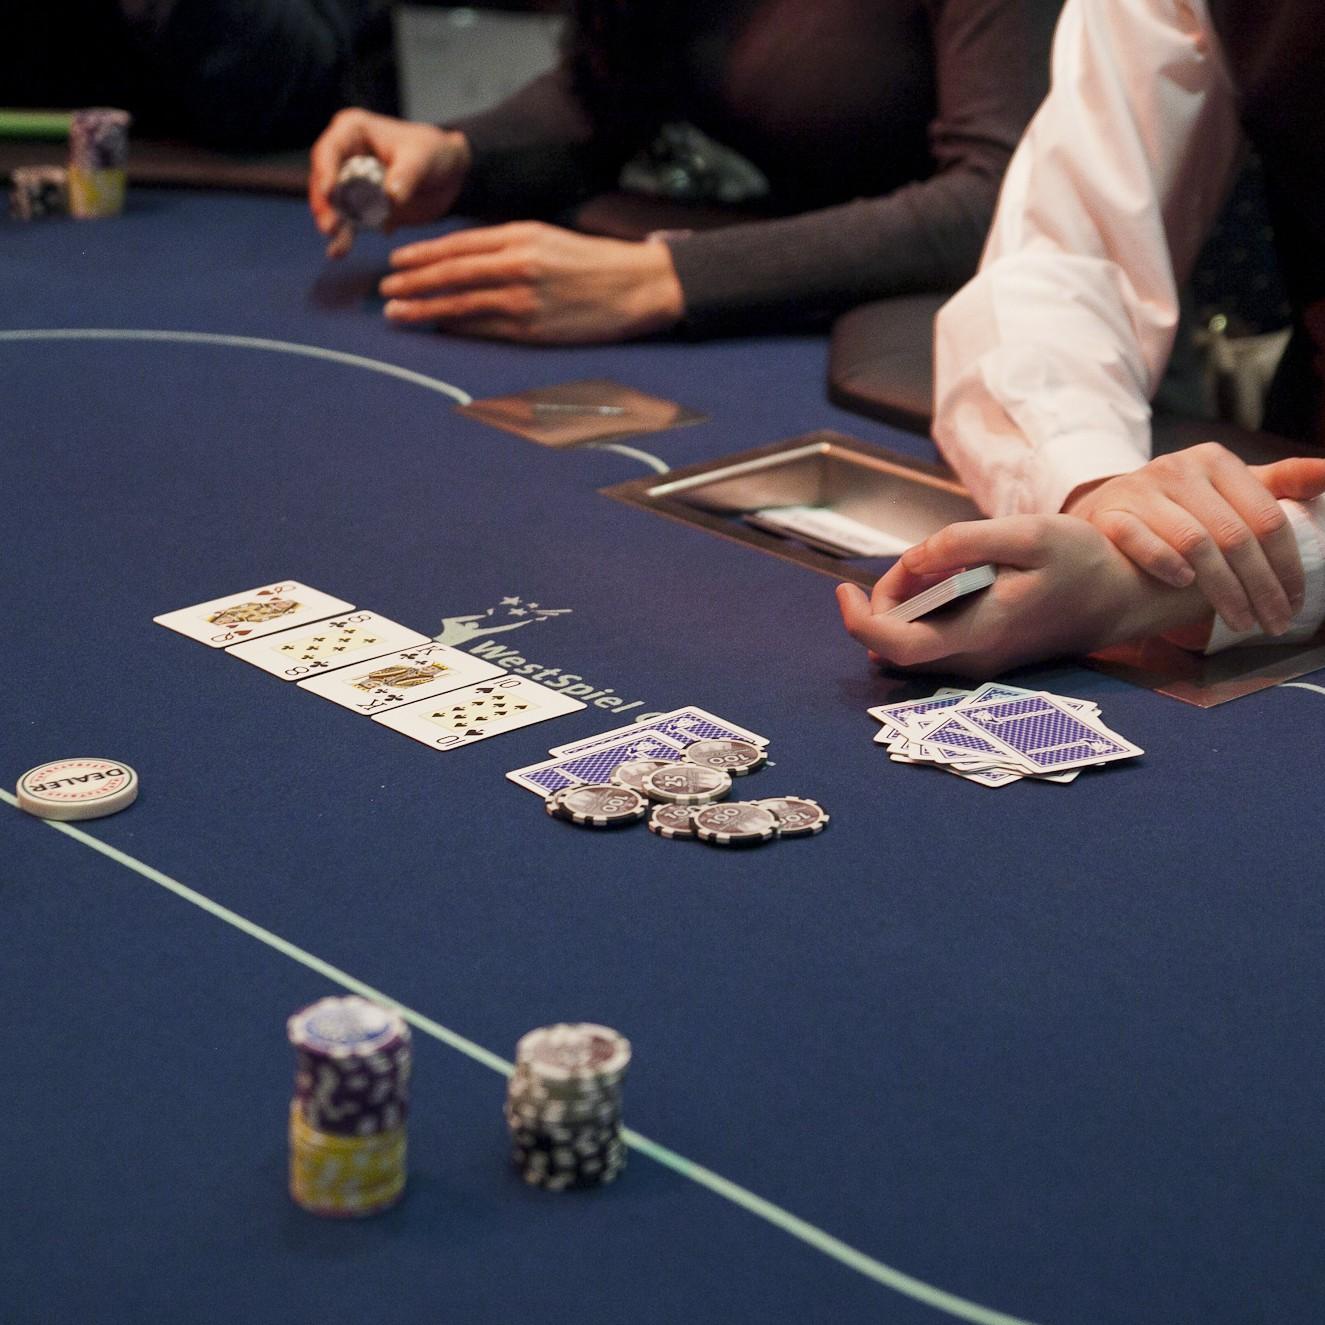 hohensyburg casino poker Dresden